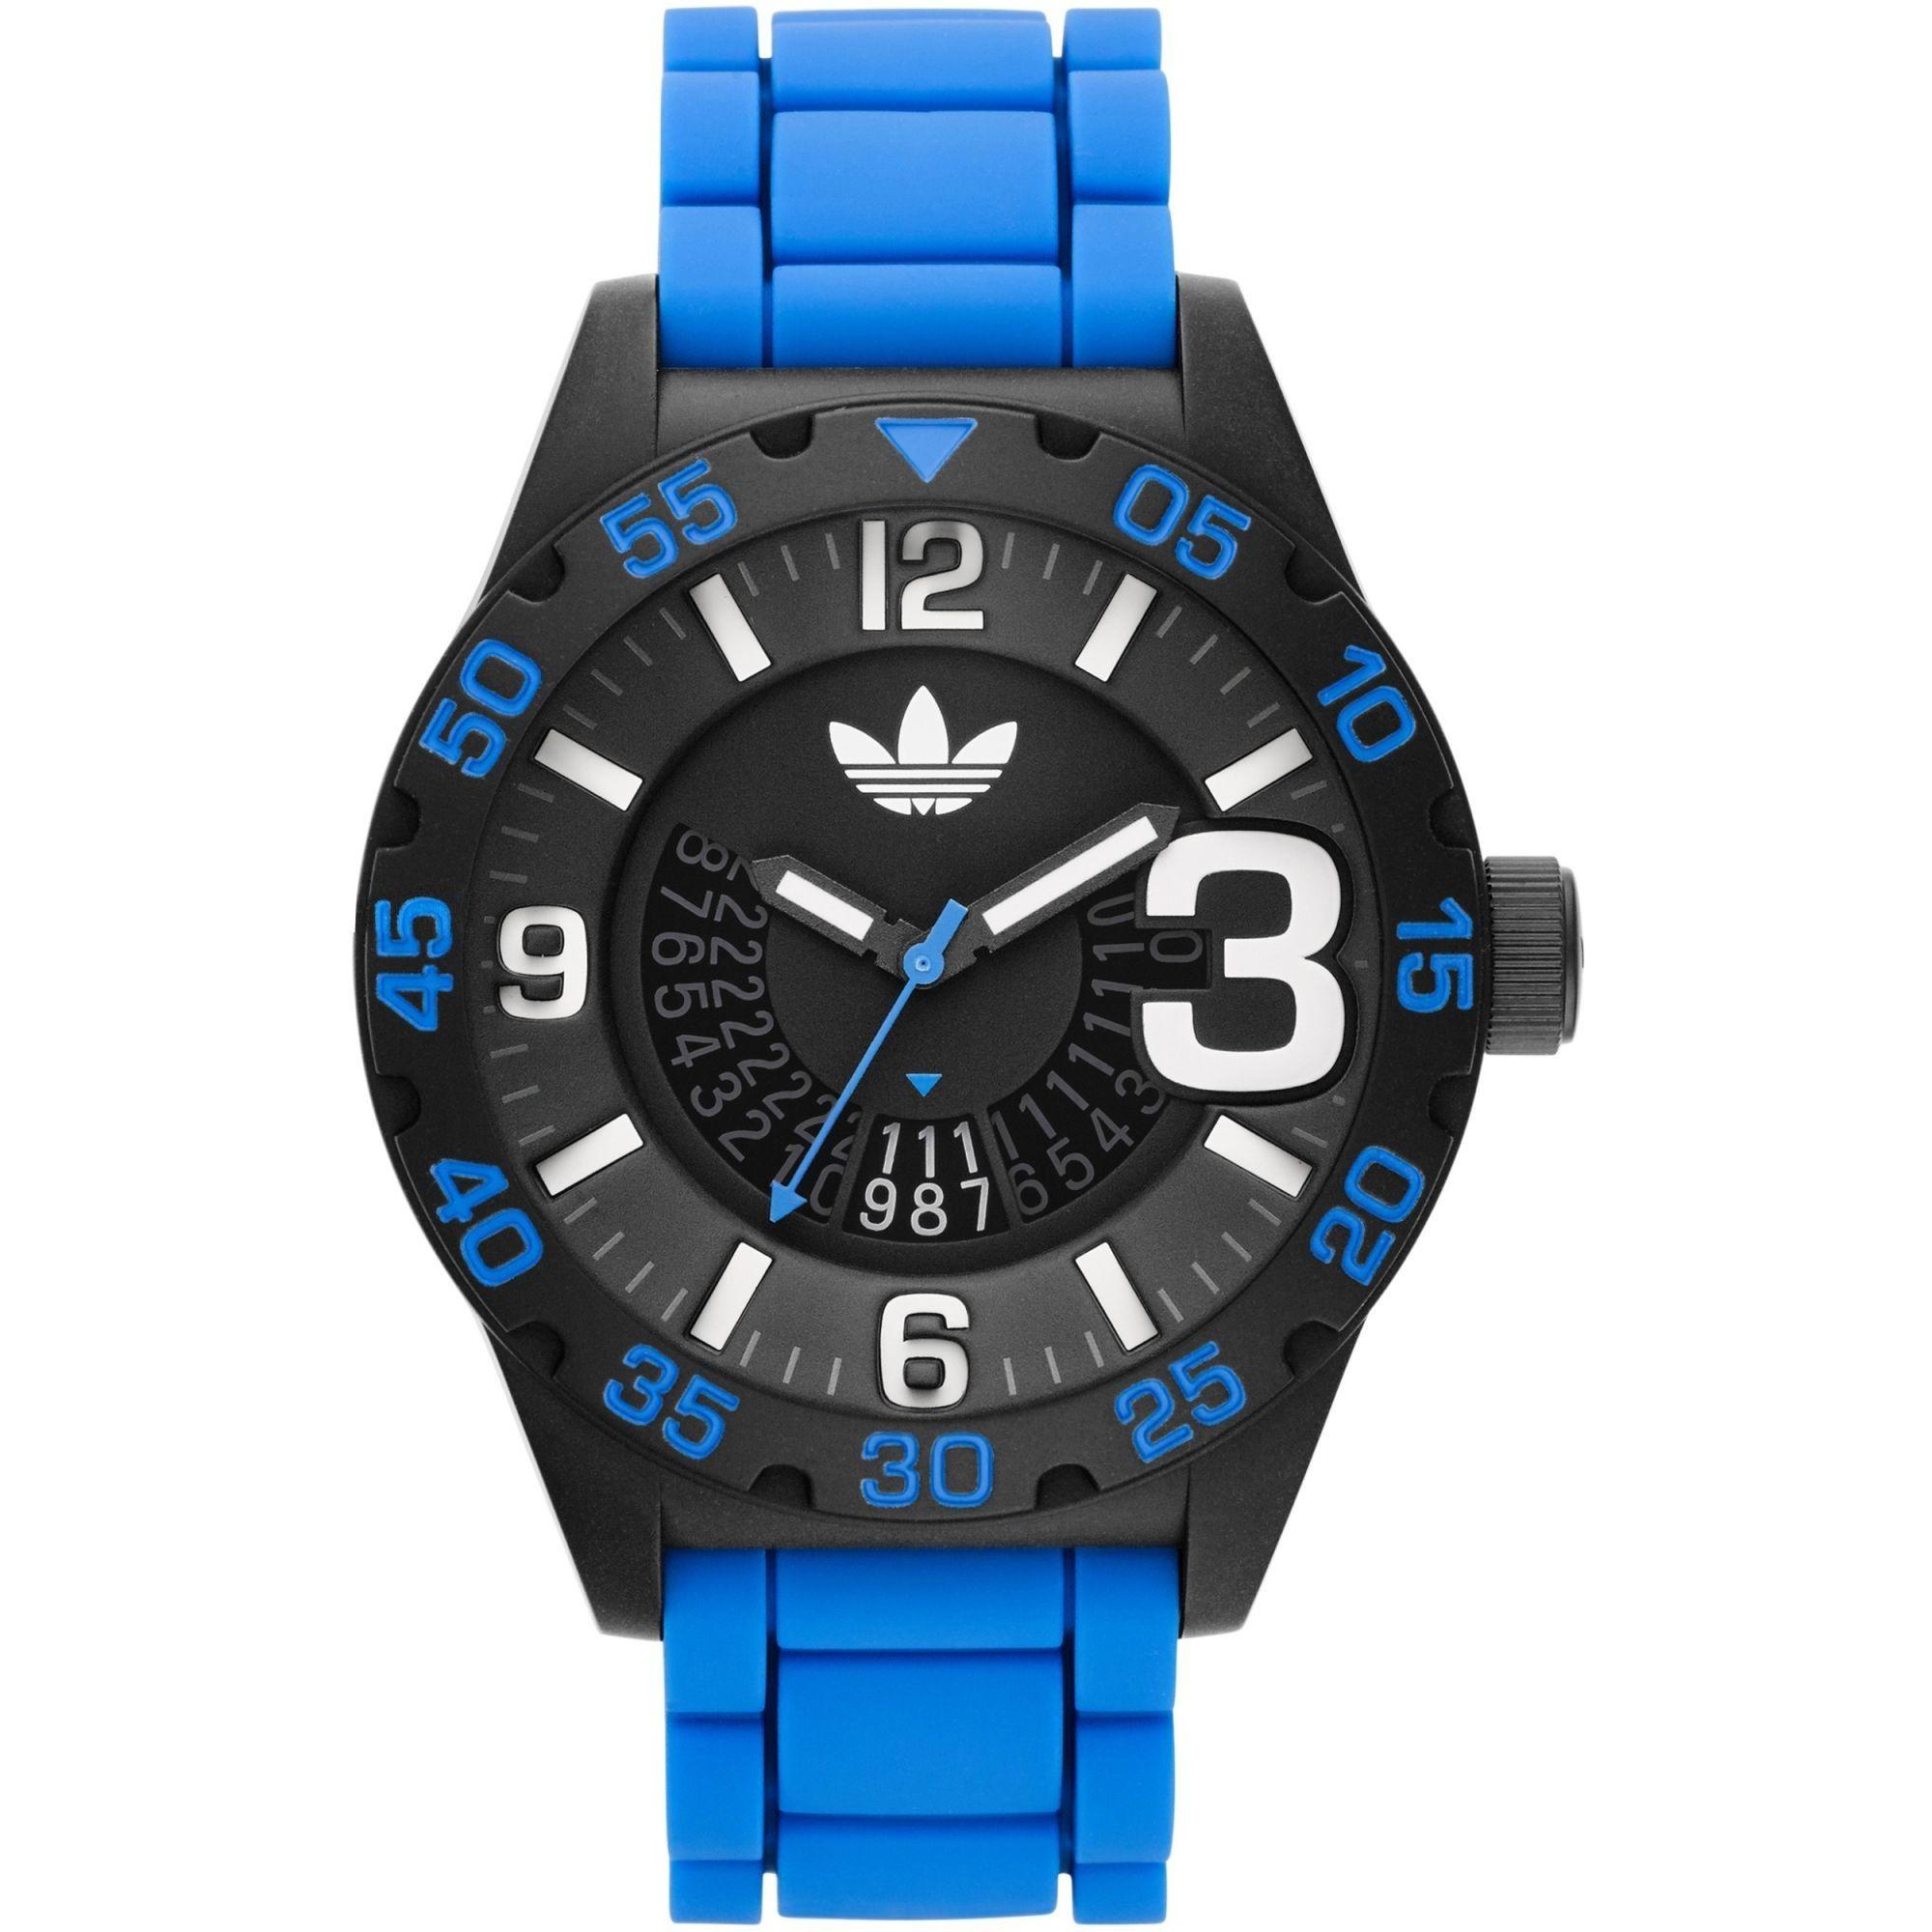 The adidas Originals Newburgh 3D Chronograph watch mixes